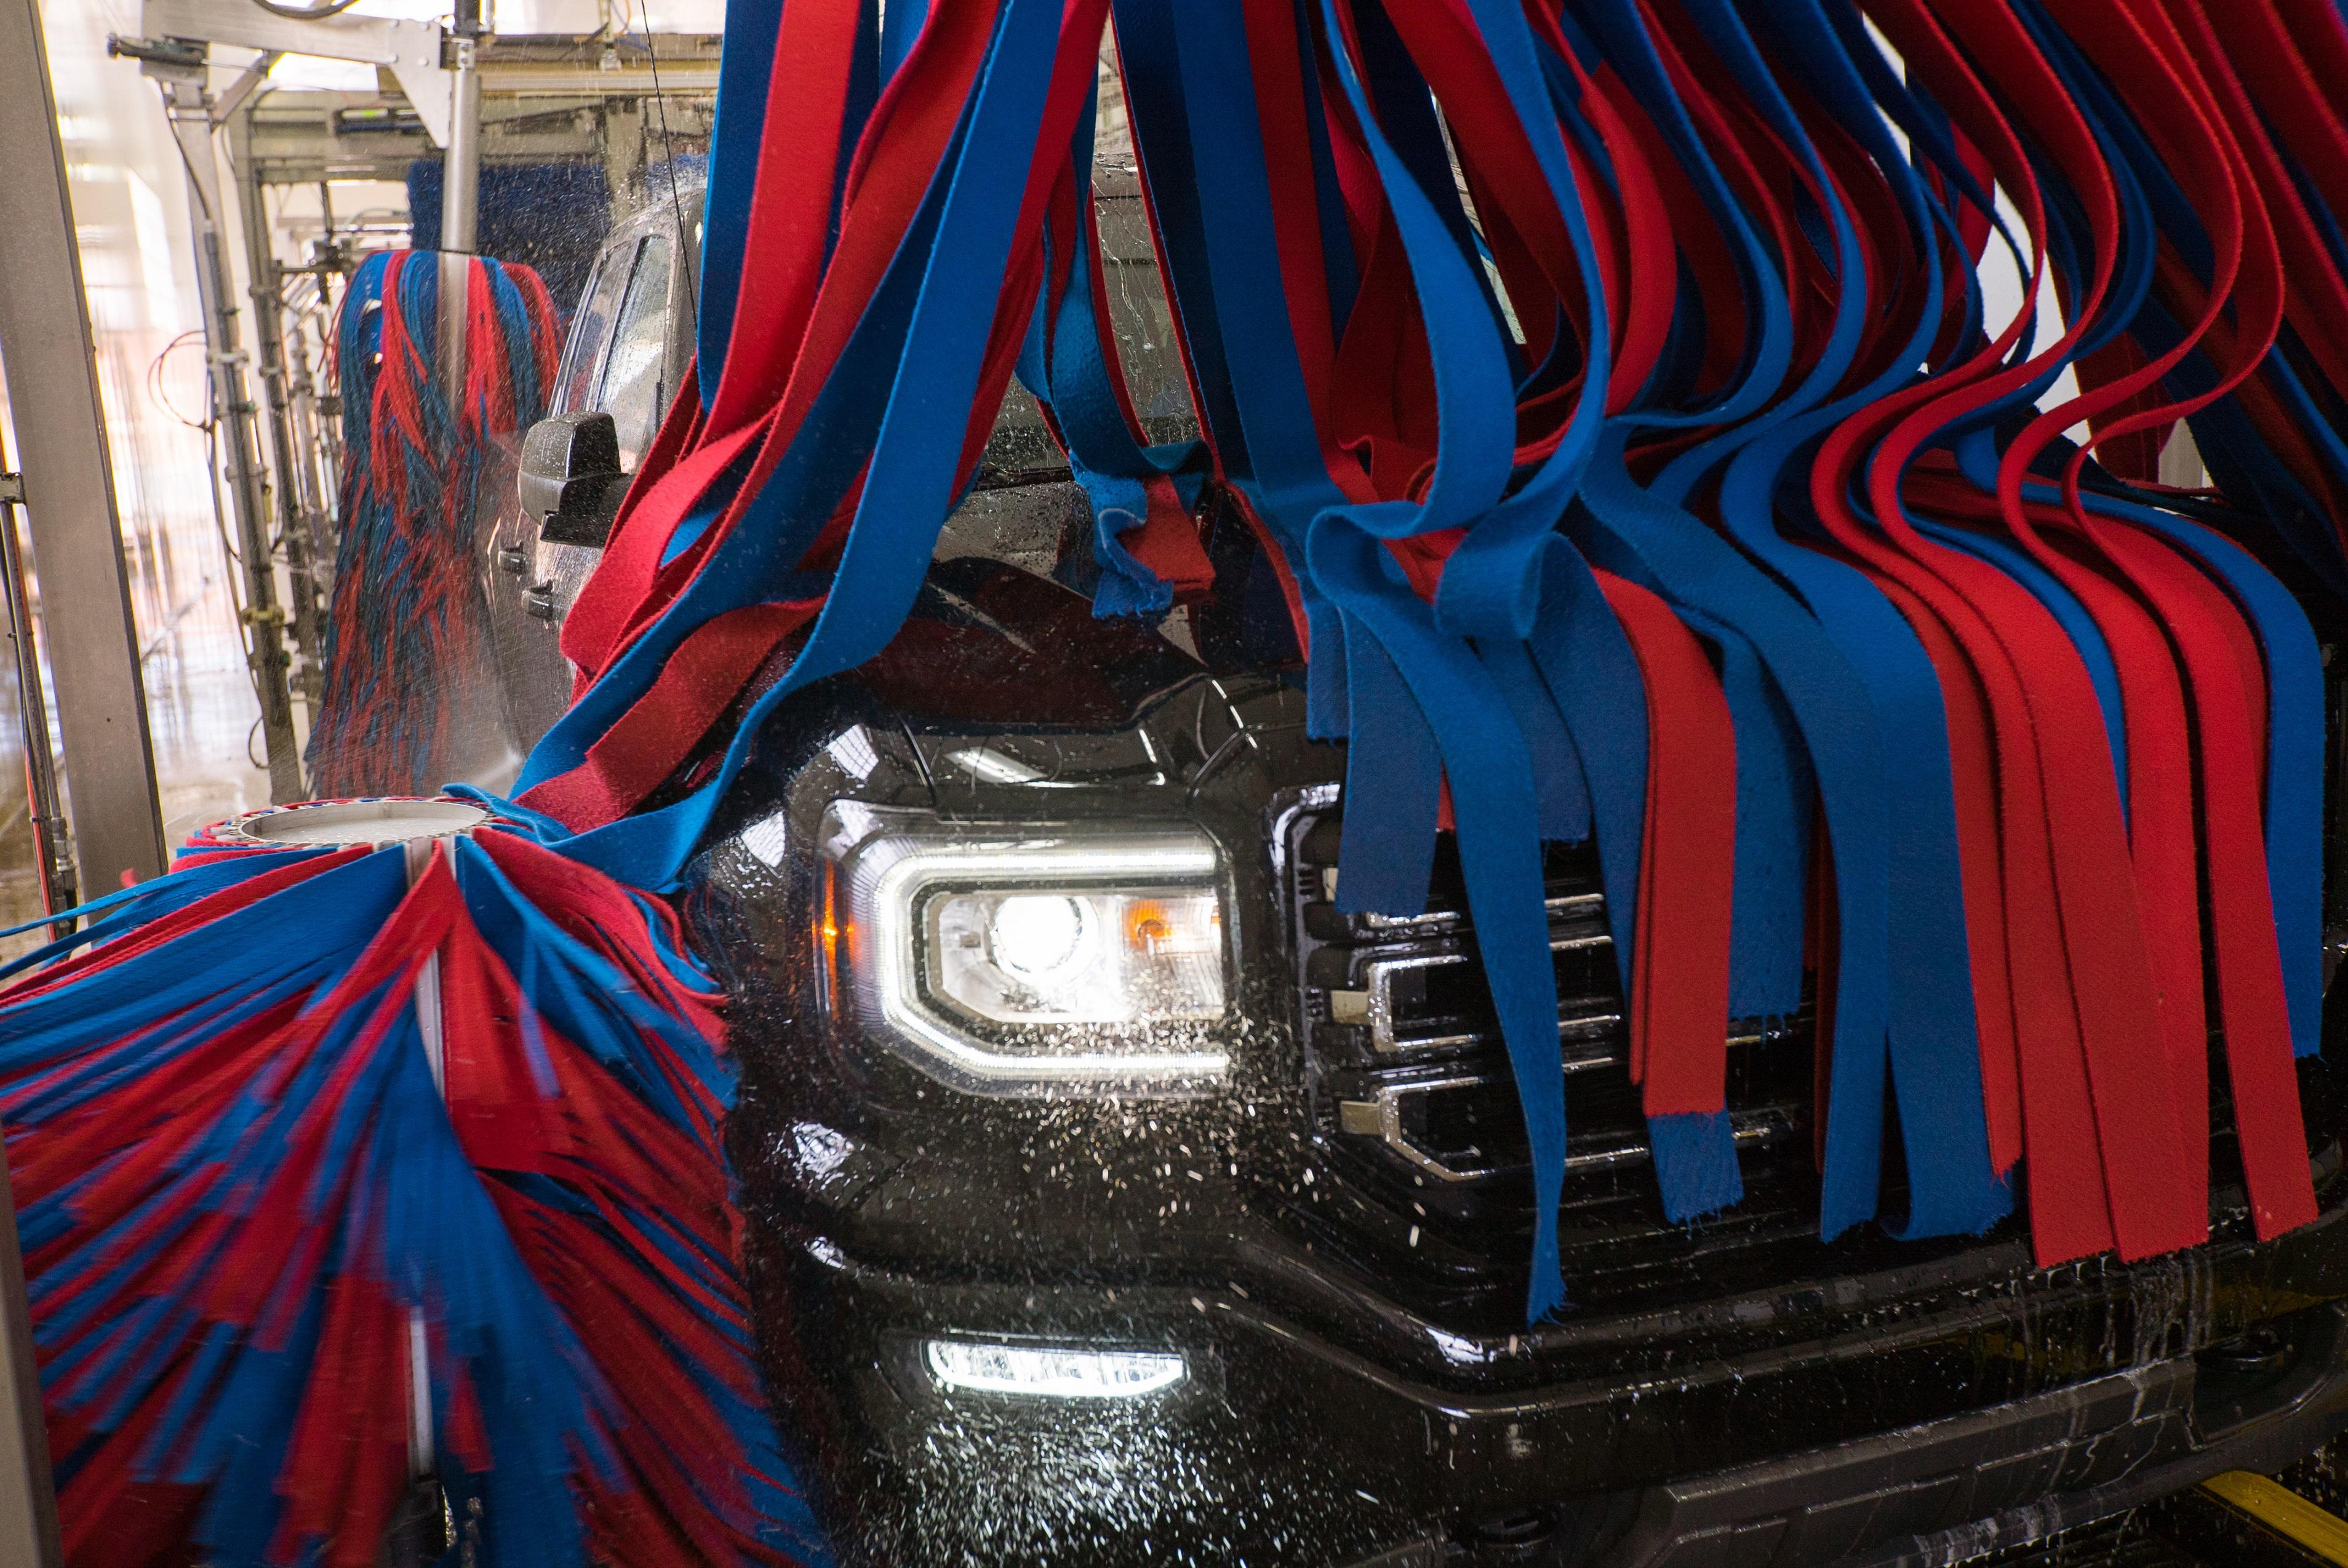 Tagg N Go Express Car Wash image 8